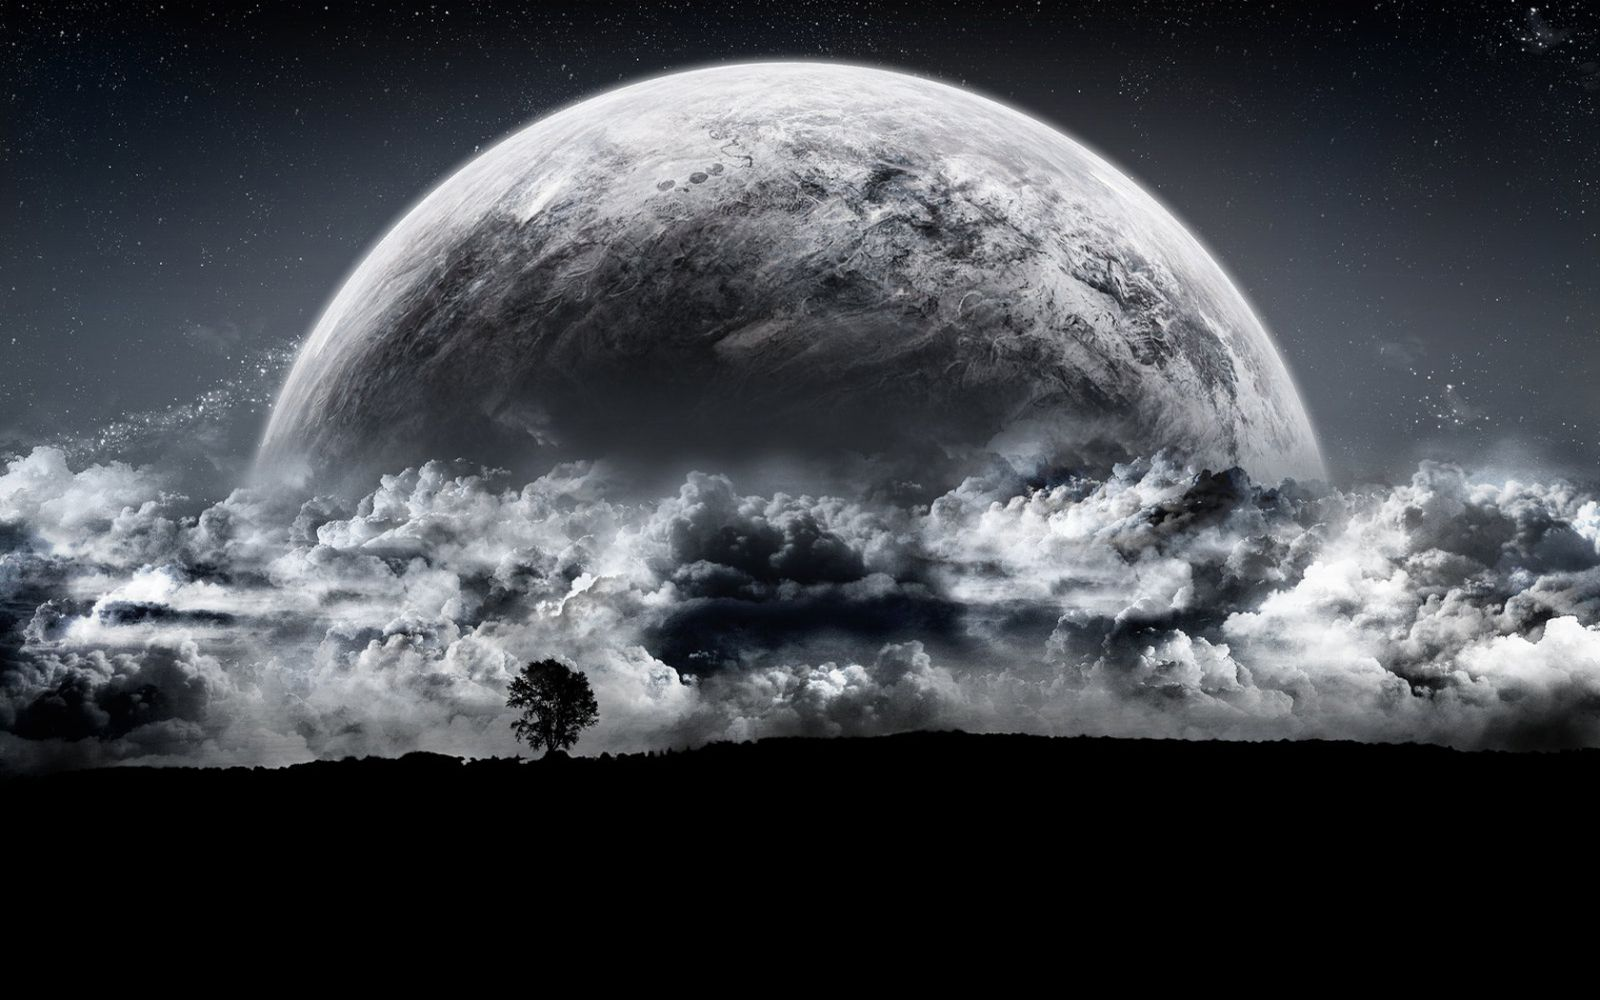 Download 150 Hd Wide Screen Wallpapers Wallpaper Pack Planets Wallpaper Beautiful Moon Dark Moon